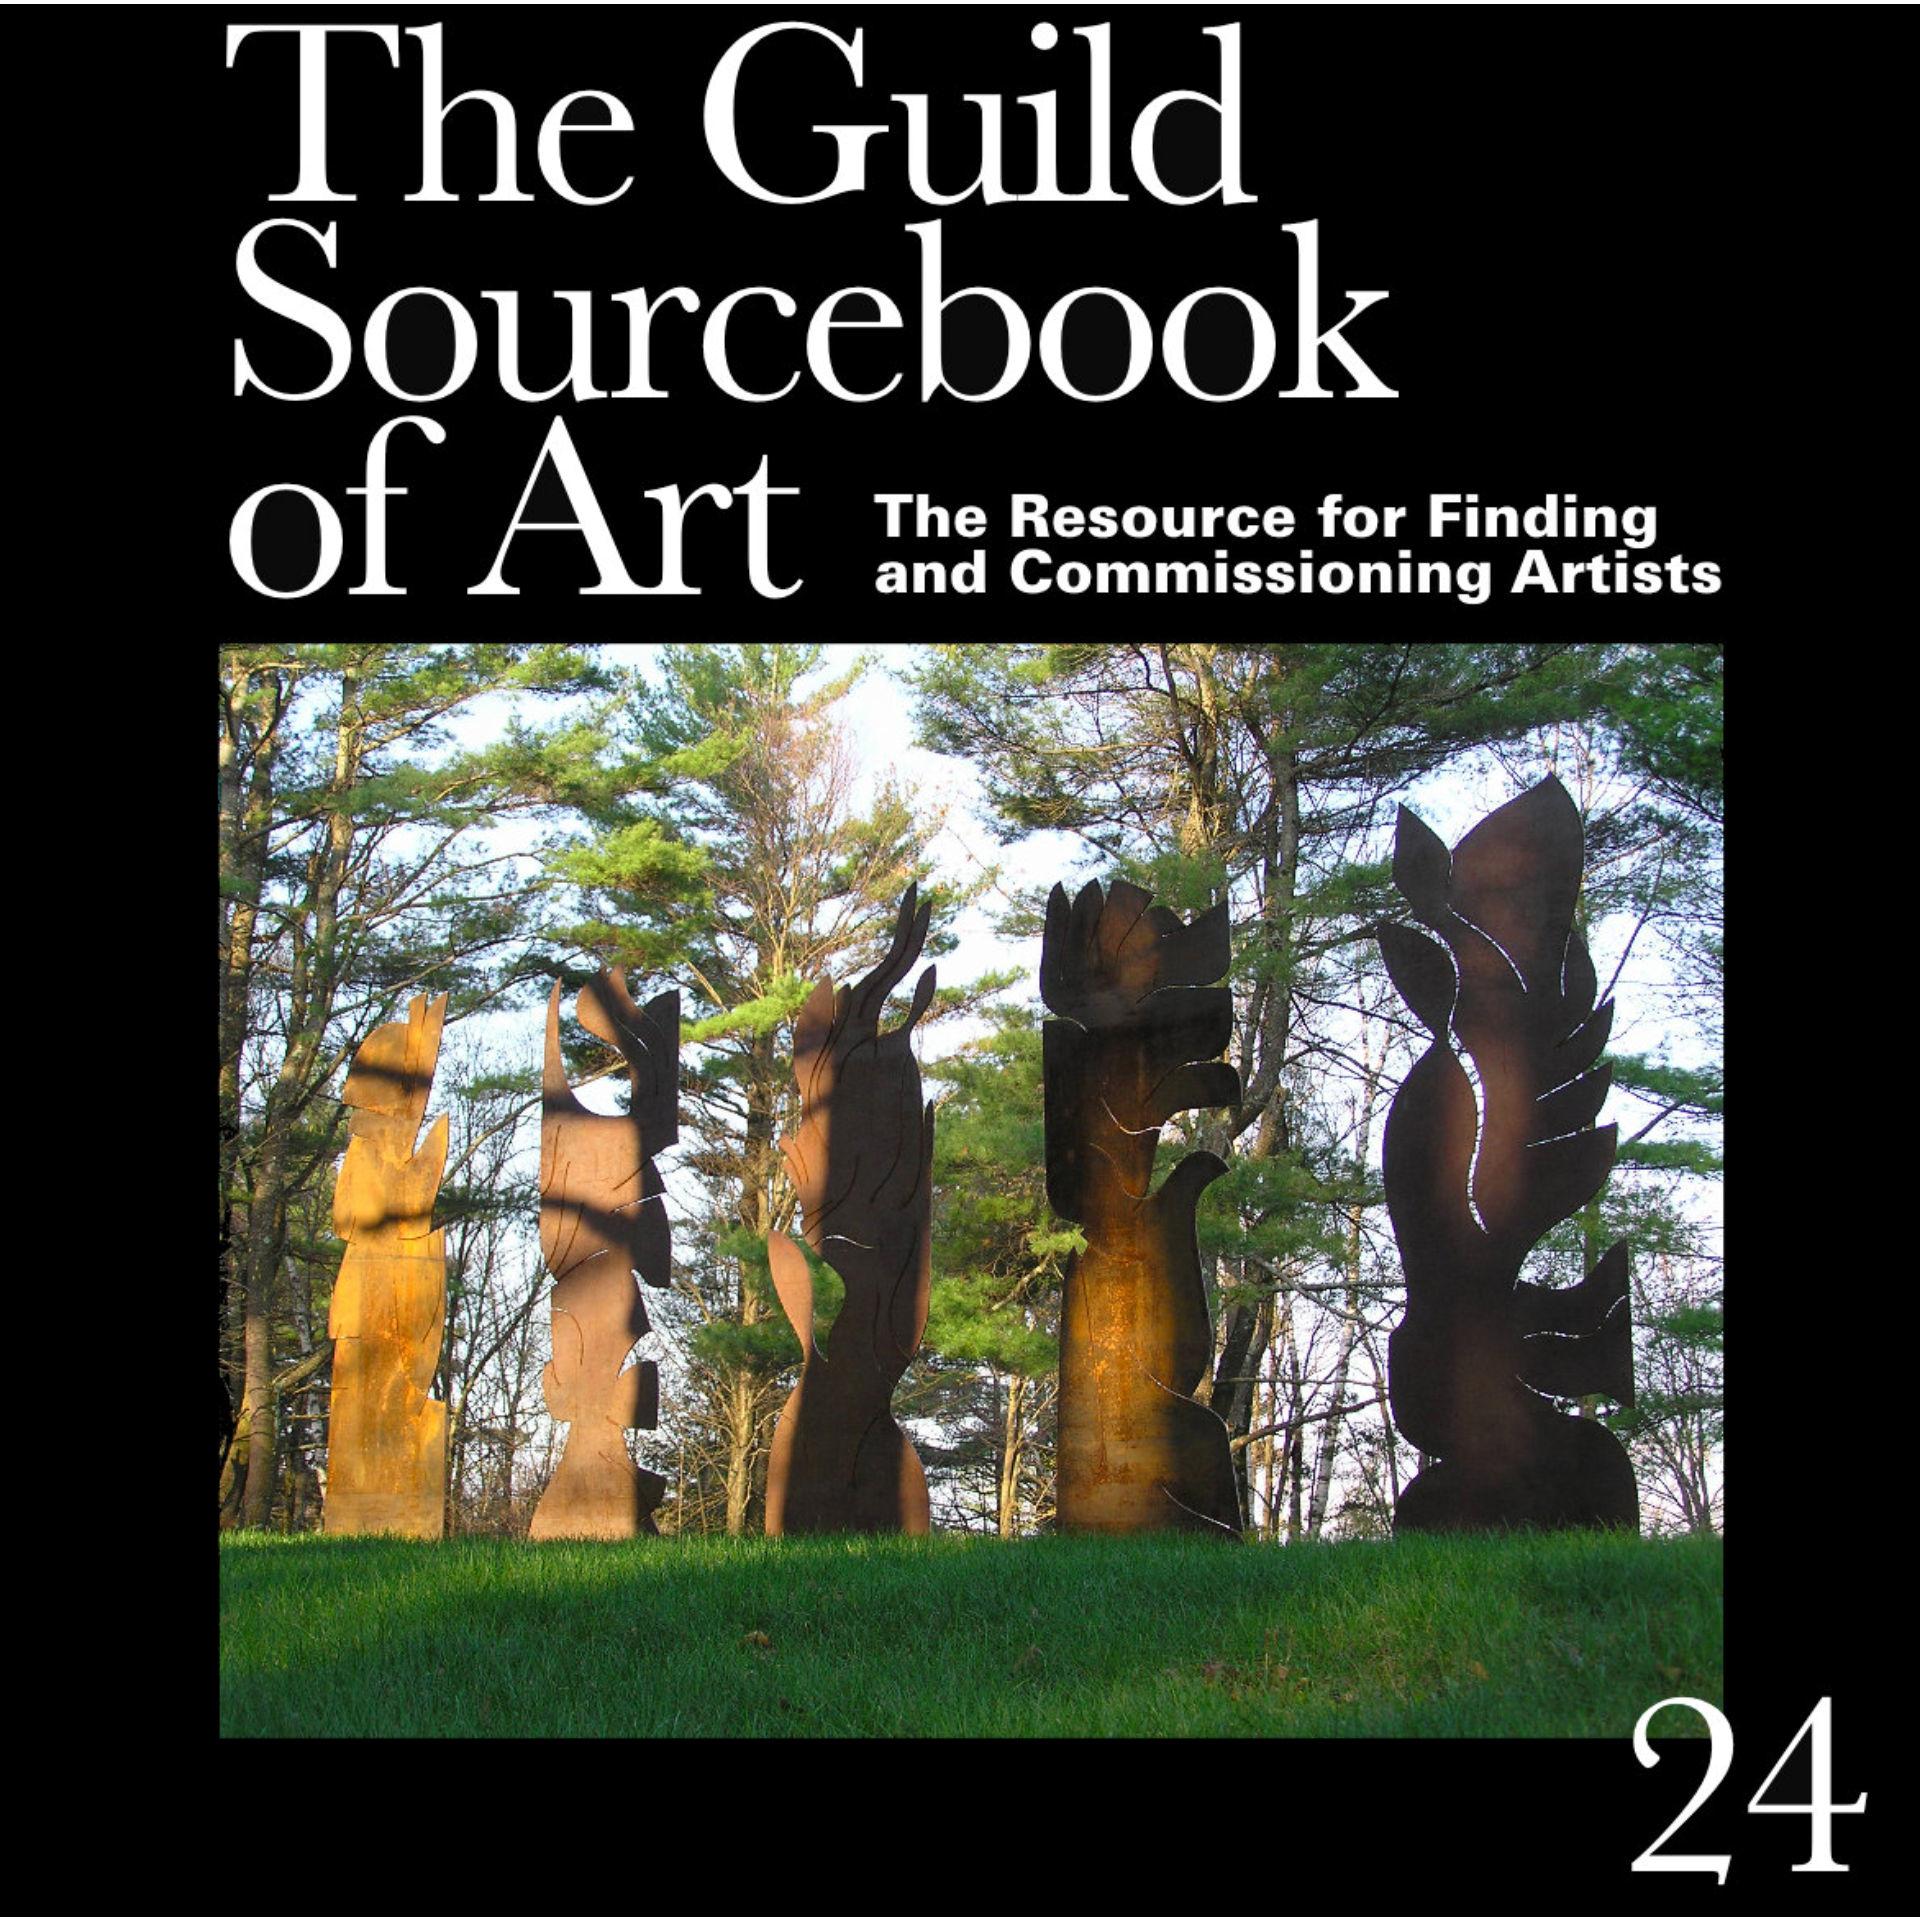 Guild Sourcebook of Art Cover #24